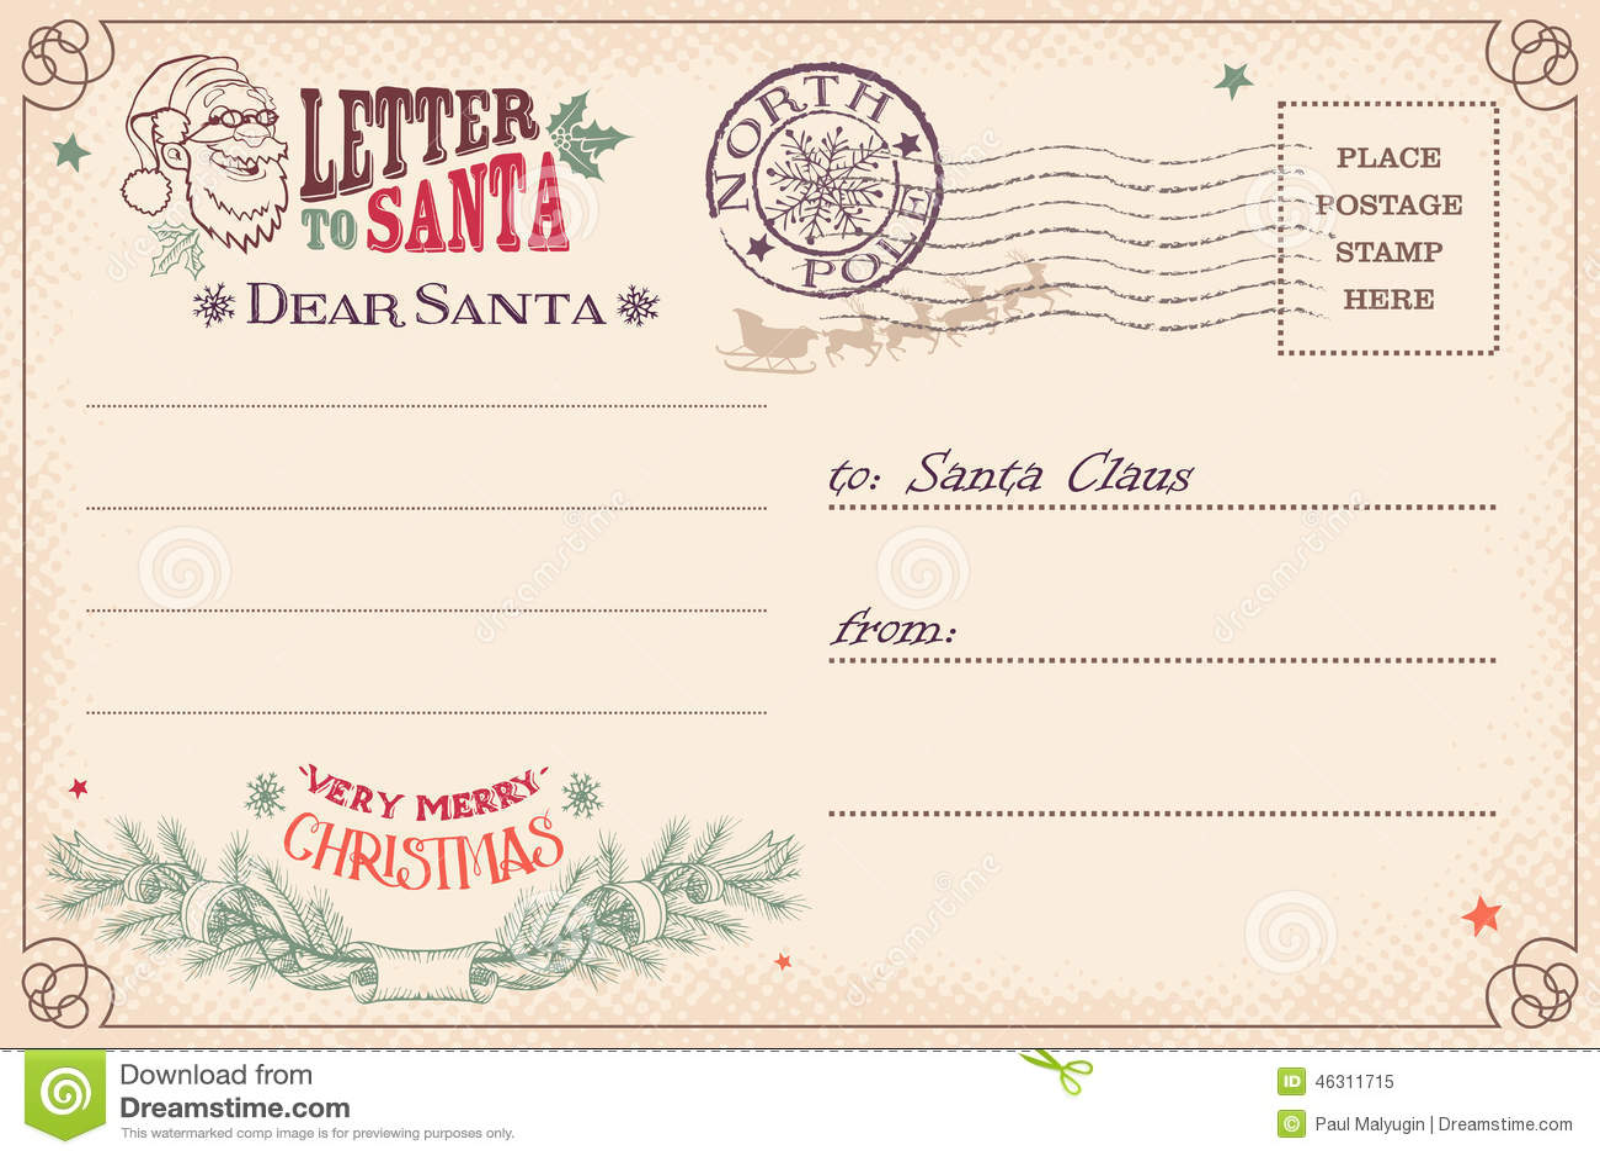 Vintage Letter To Santa Claus Postcard Stock Vector - Image: 46311715